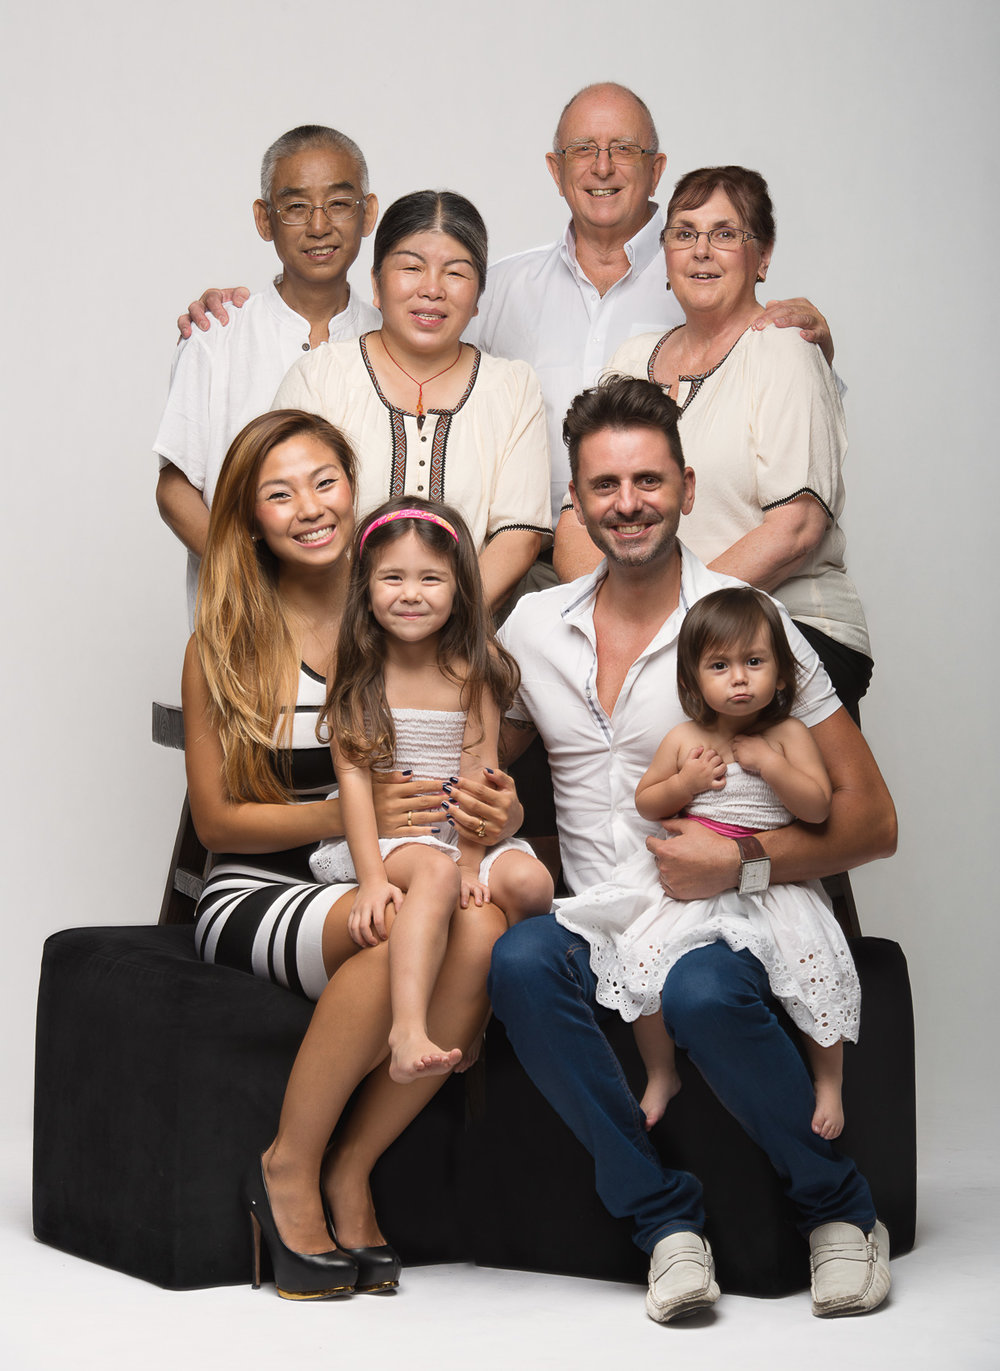 20140829_Portrait_Scott's-Family_F-3(Crop).jpg